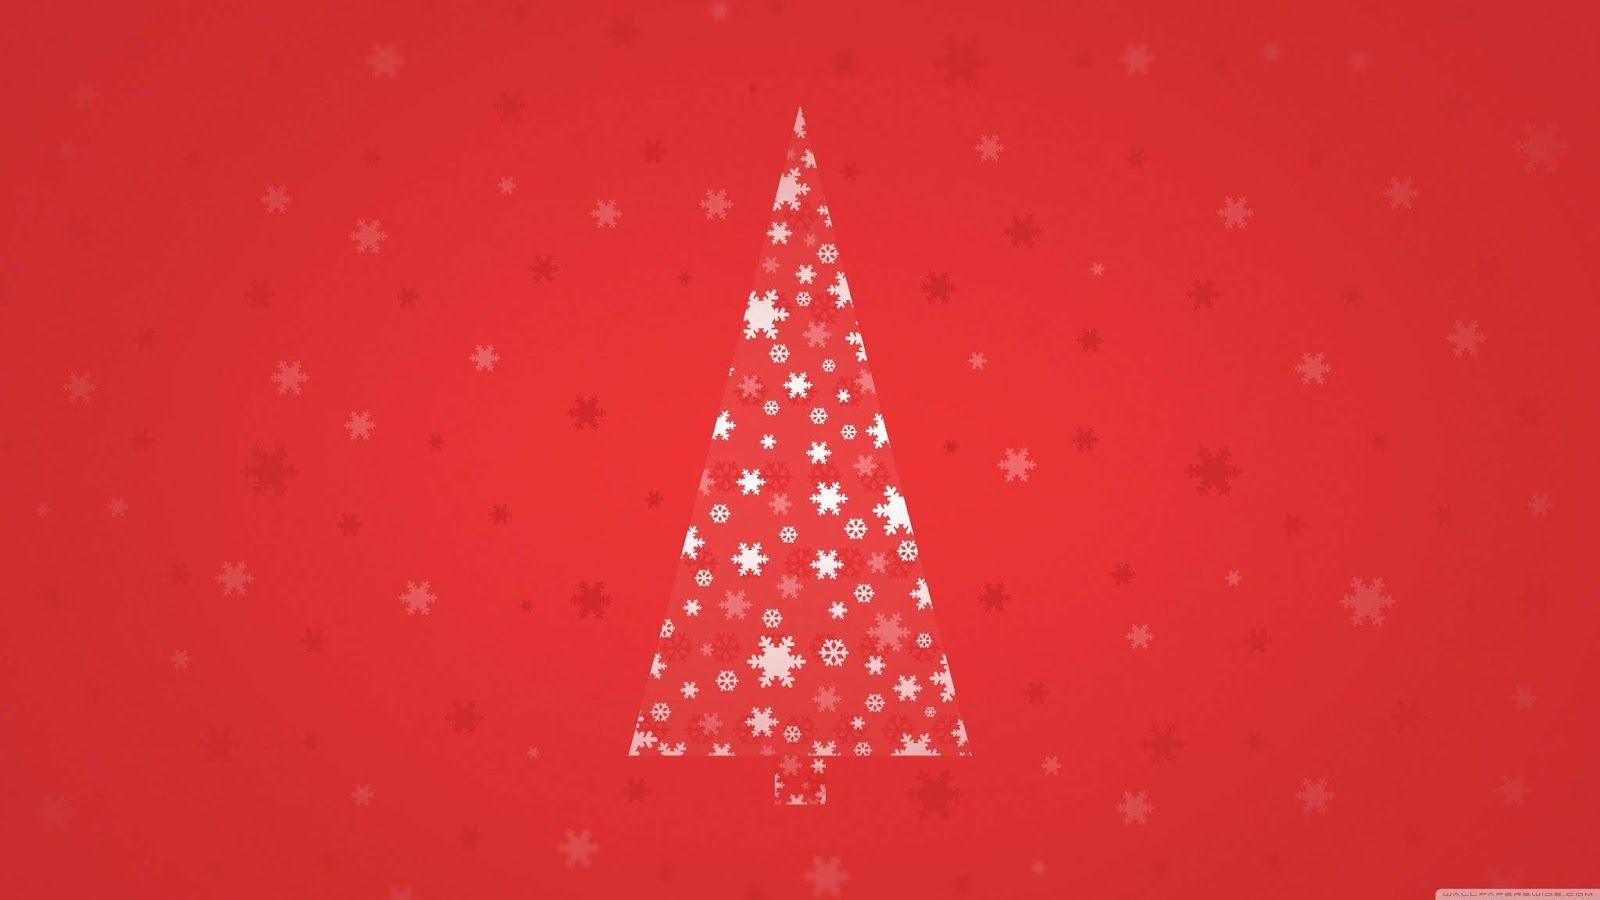 85 Beautiful Christmas Hd Wallpapers 2019 Wallpapers